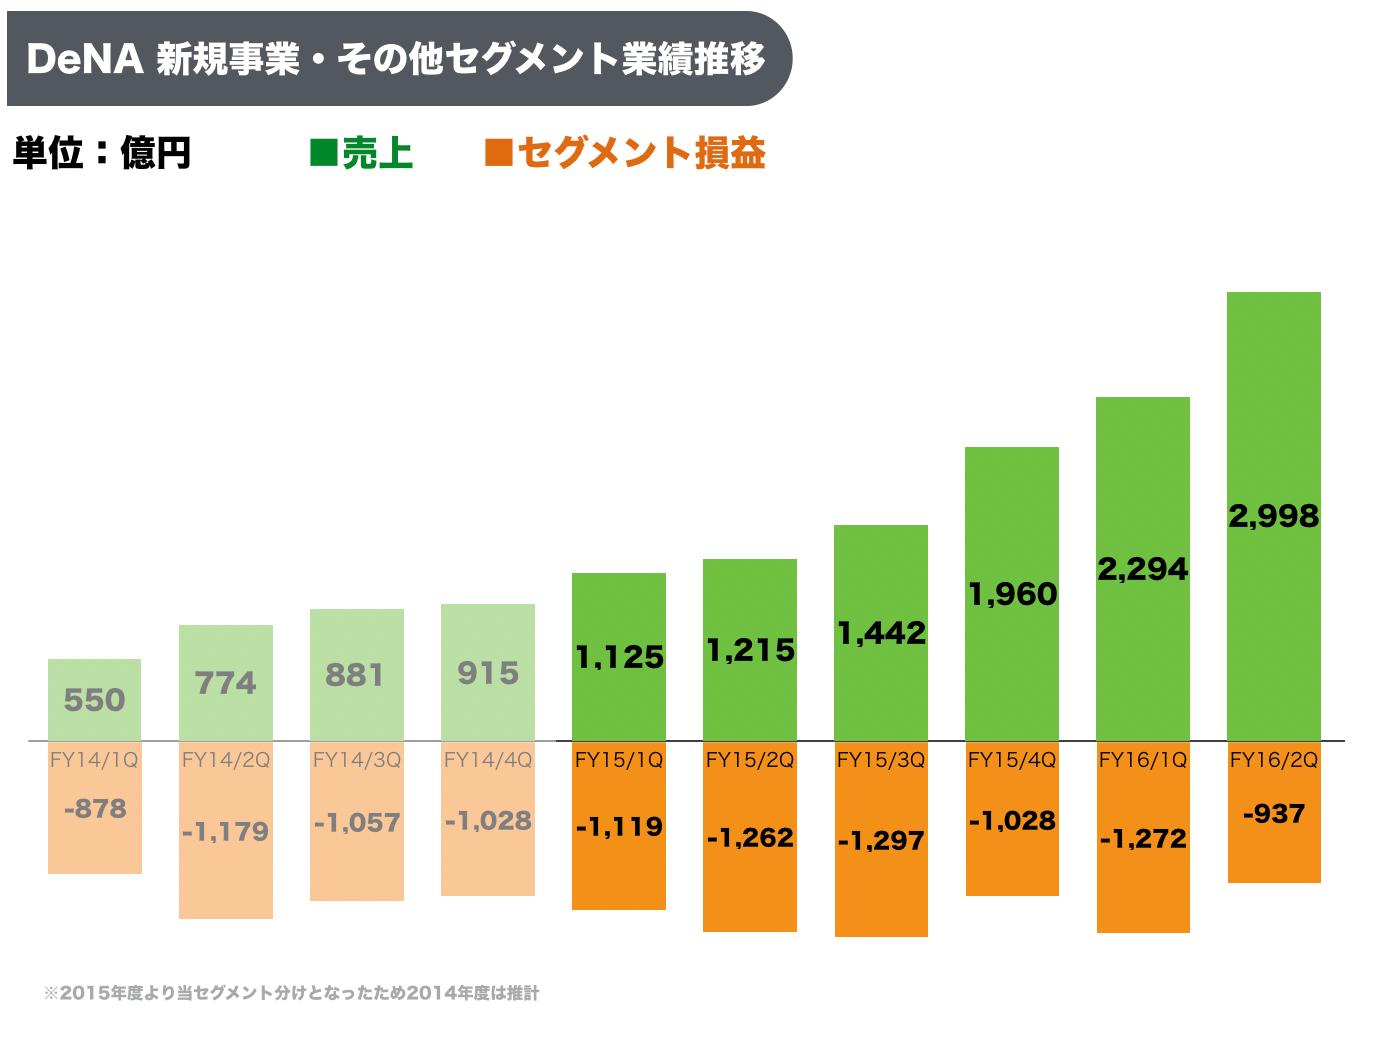 dena%e3%83%8f%e3%82%9a%e3%83%ac%e3%83%83%e3%83%88%e5%a3%b2%e4%b8%8a%e6%8e%a8%e7%a7%bb%e3%83%bb%e6%a5%ad%e7%b8%be%e6%8e%a8%e7%a7%bb